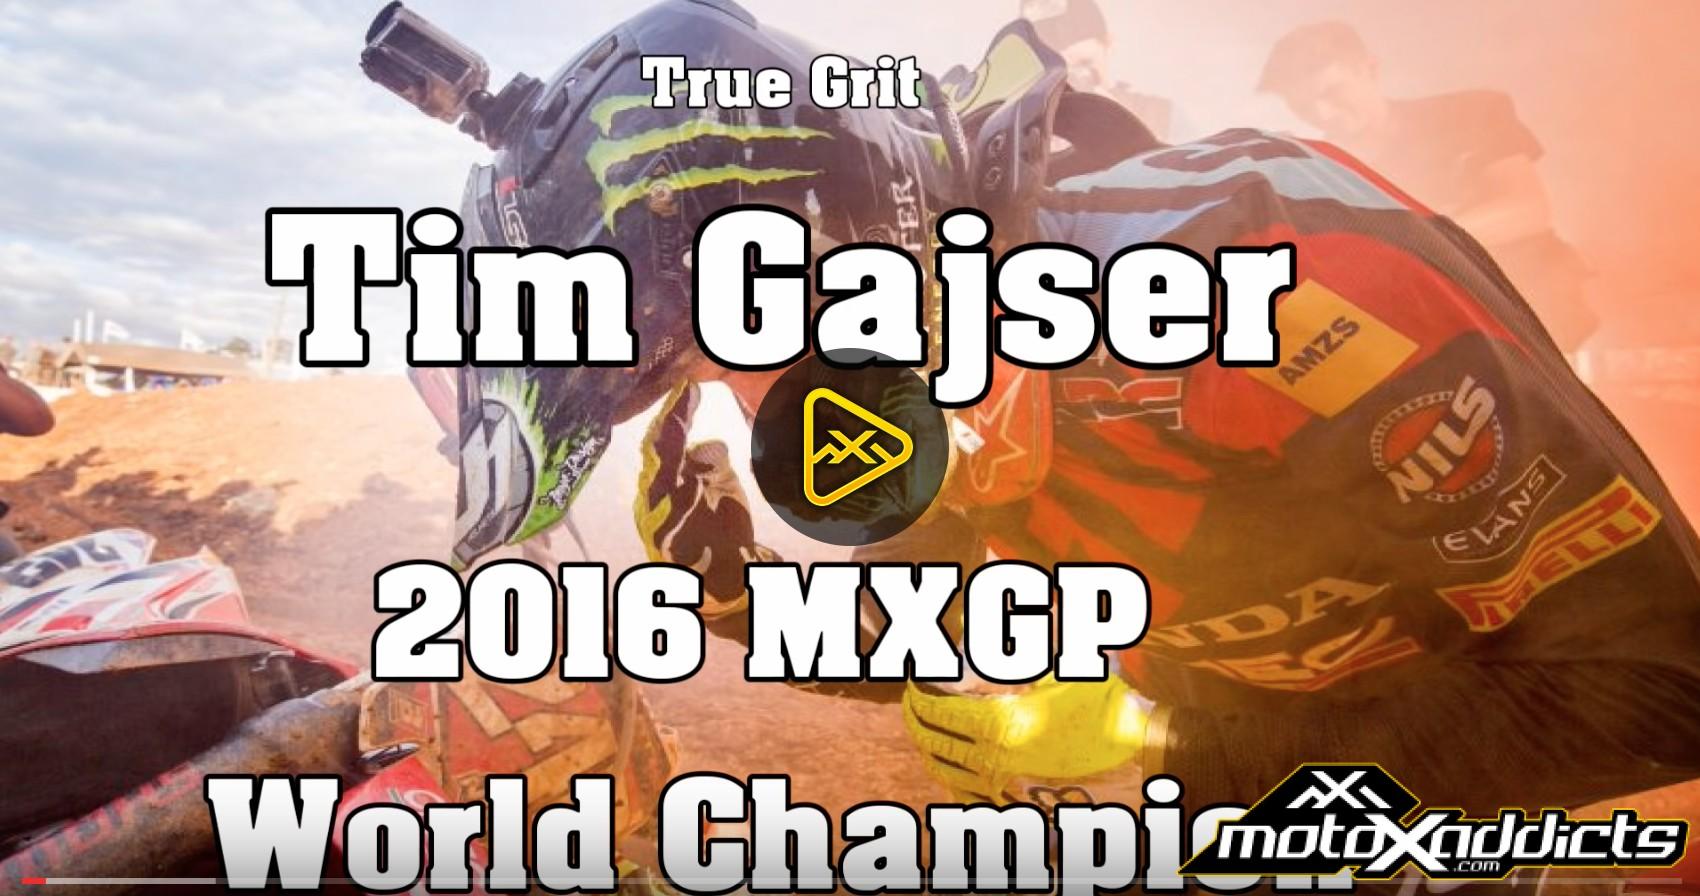 True Grit – Tim Gajser: 2016 MXGP World Champion